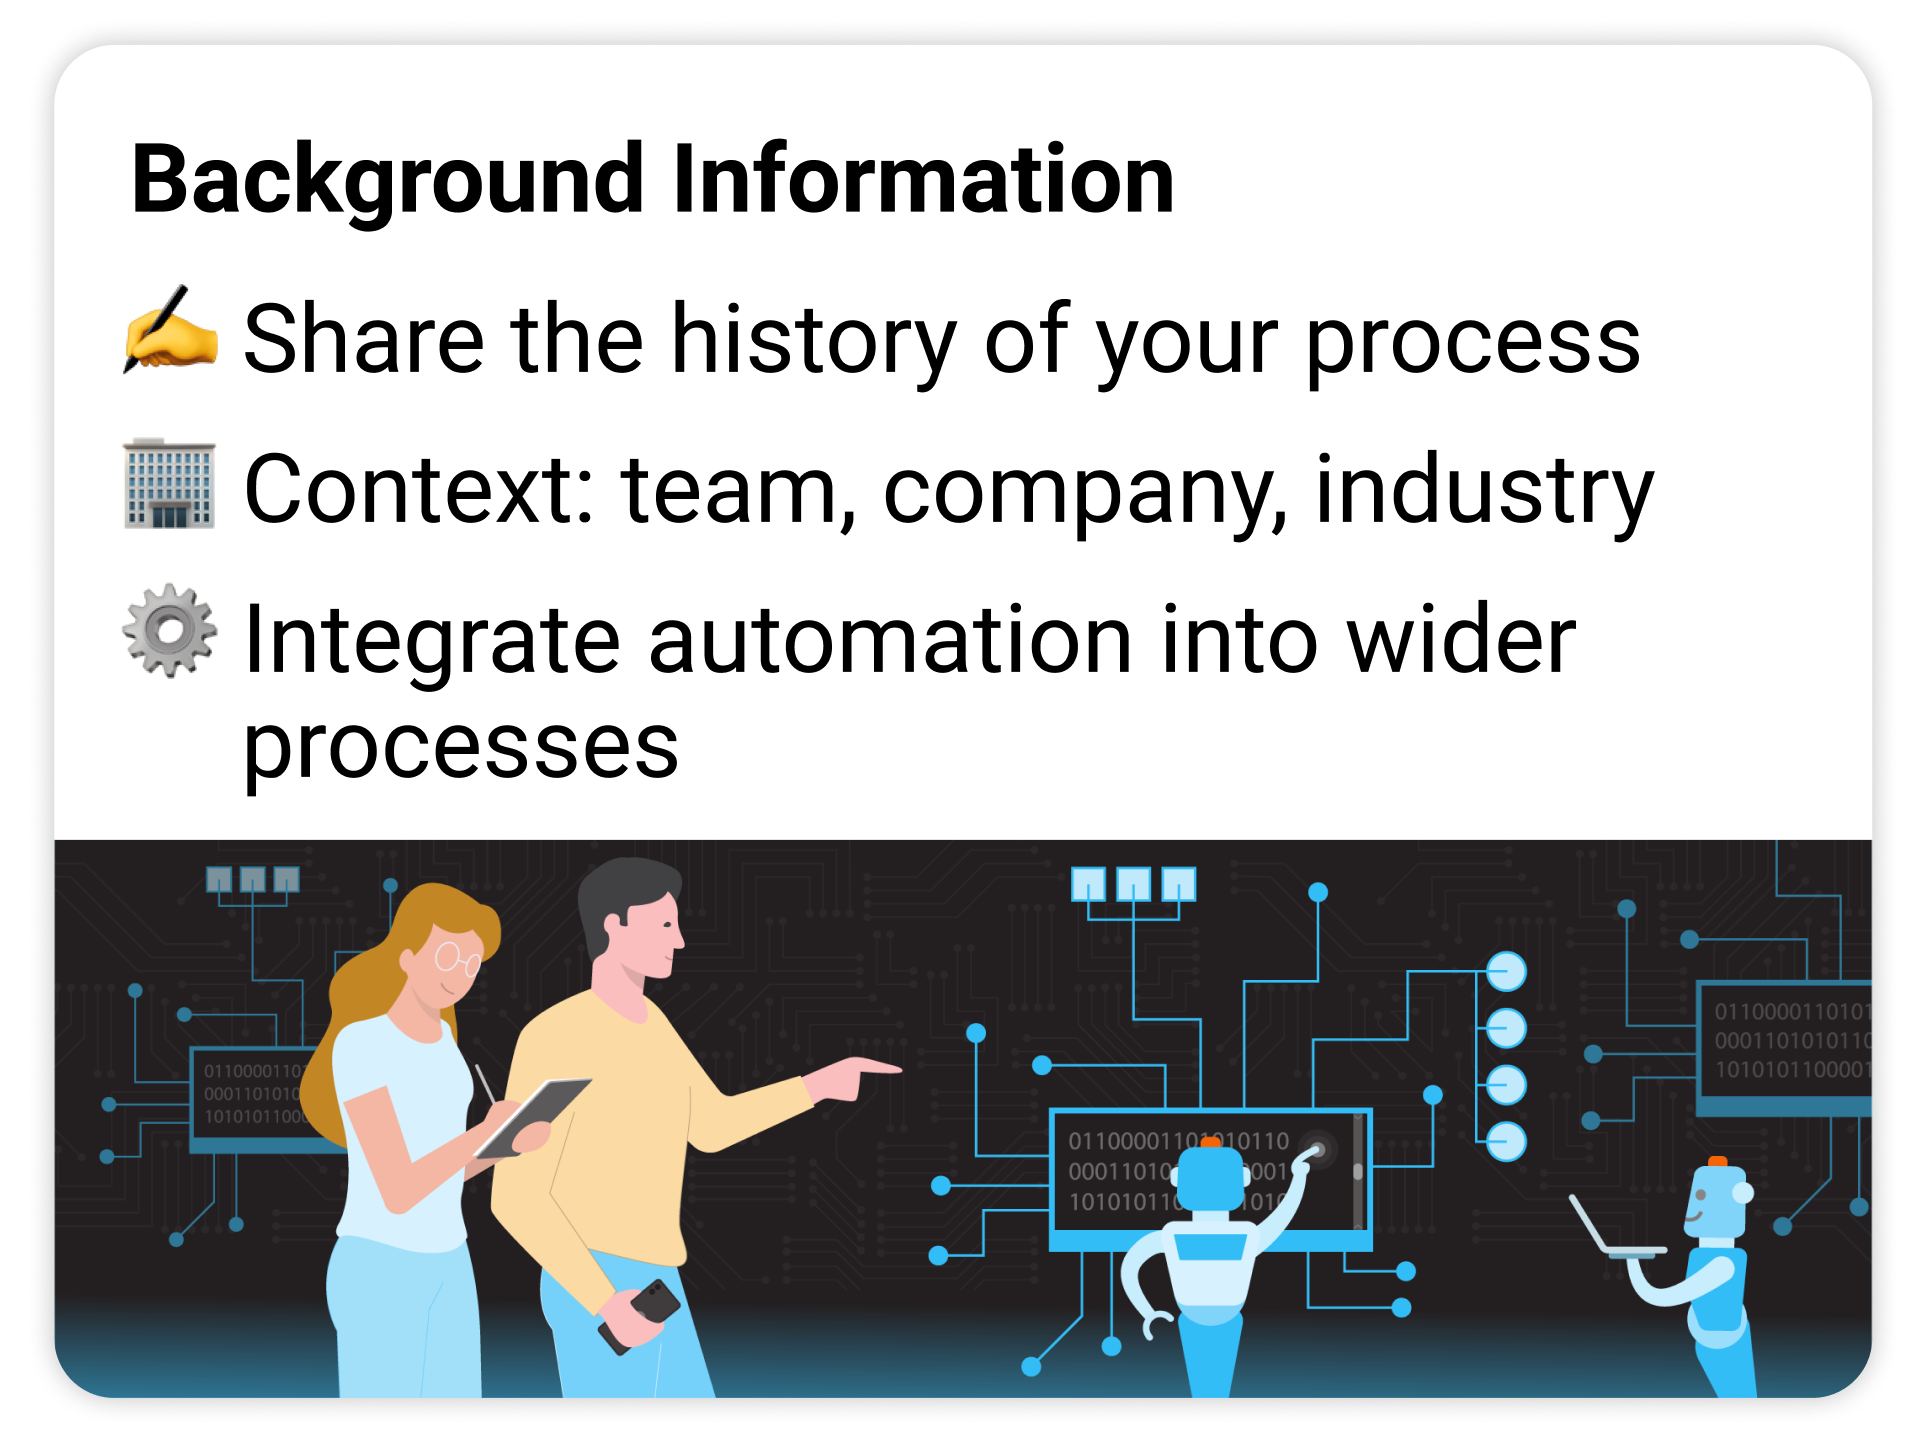 Explain the process background